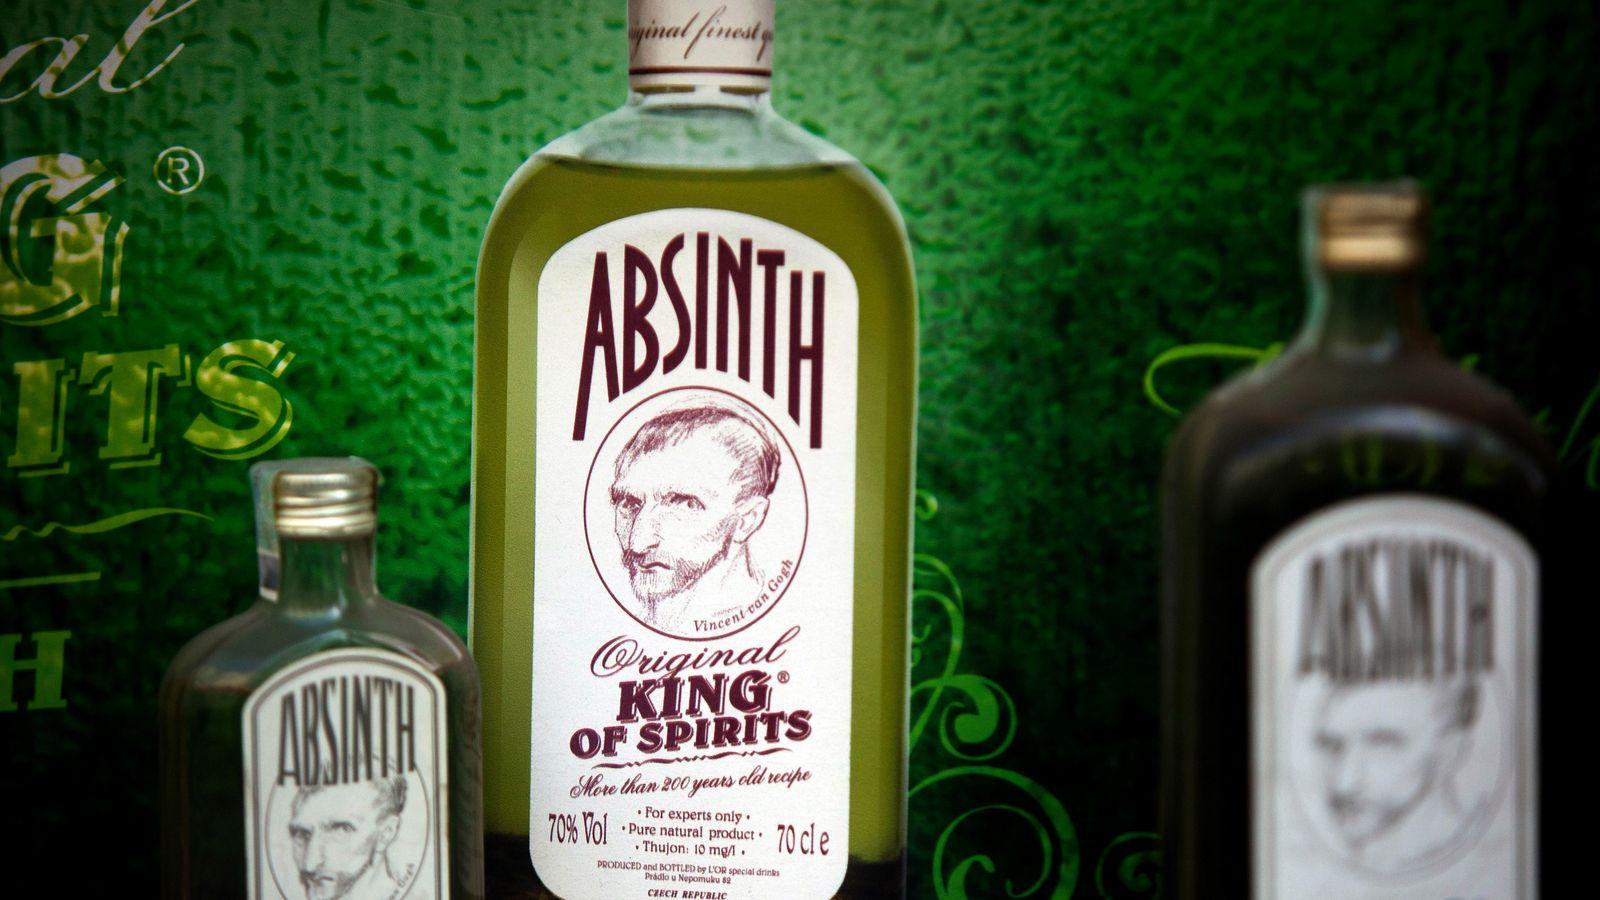 Absinthe bottles in Prague, featuring infamous enthusiast Vincent van Gogh.